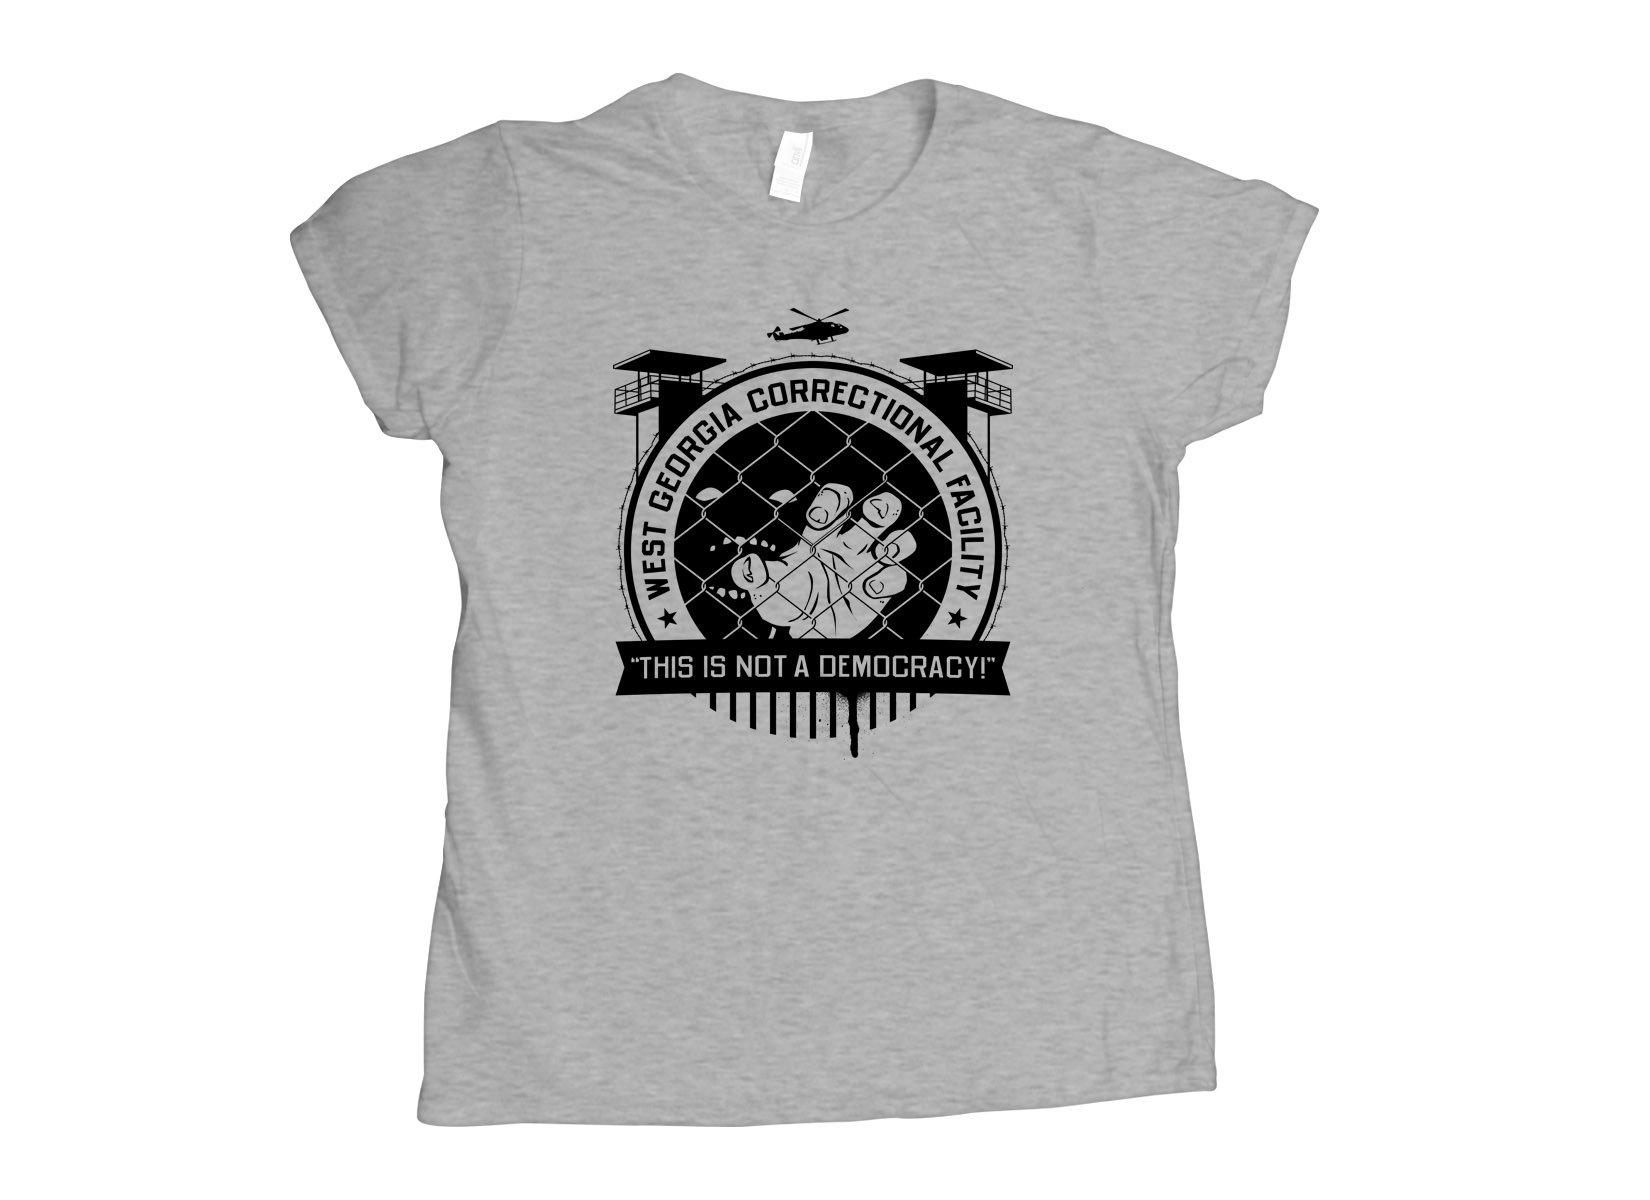 West Georgia Correctional Facility on Womens T-Shirt